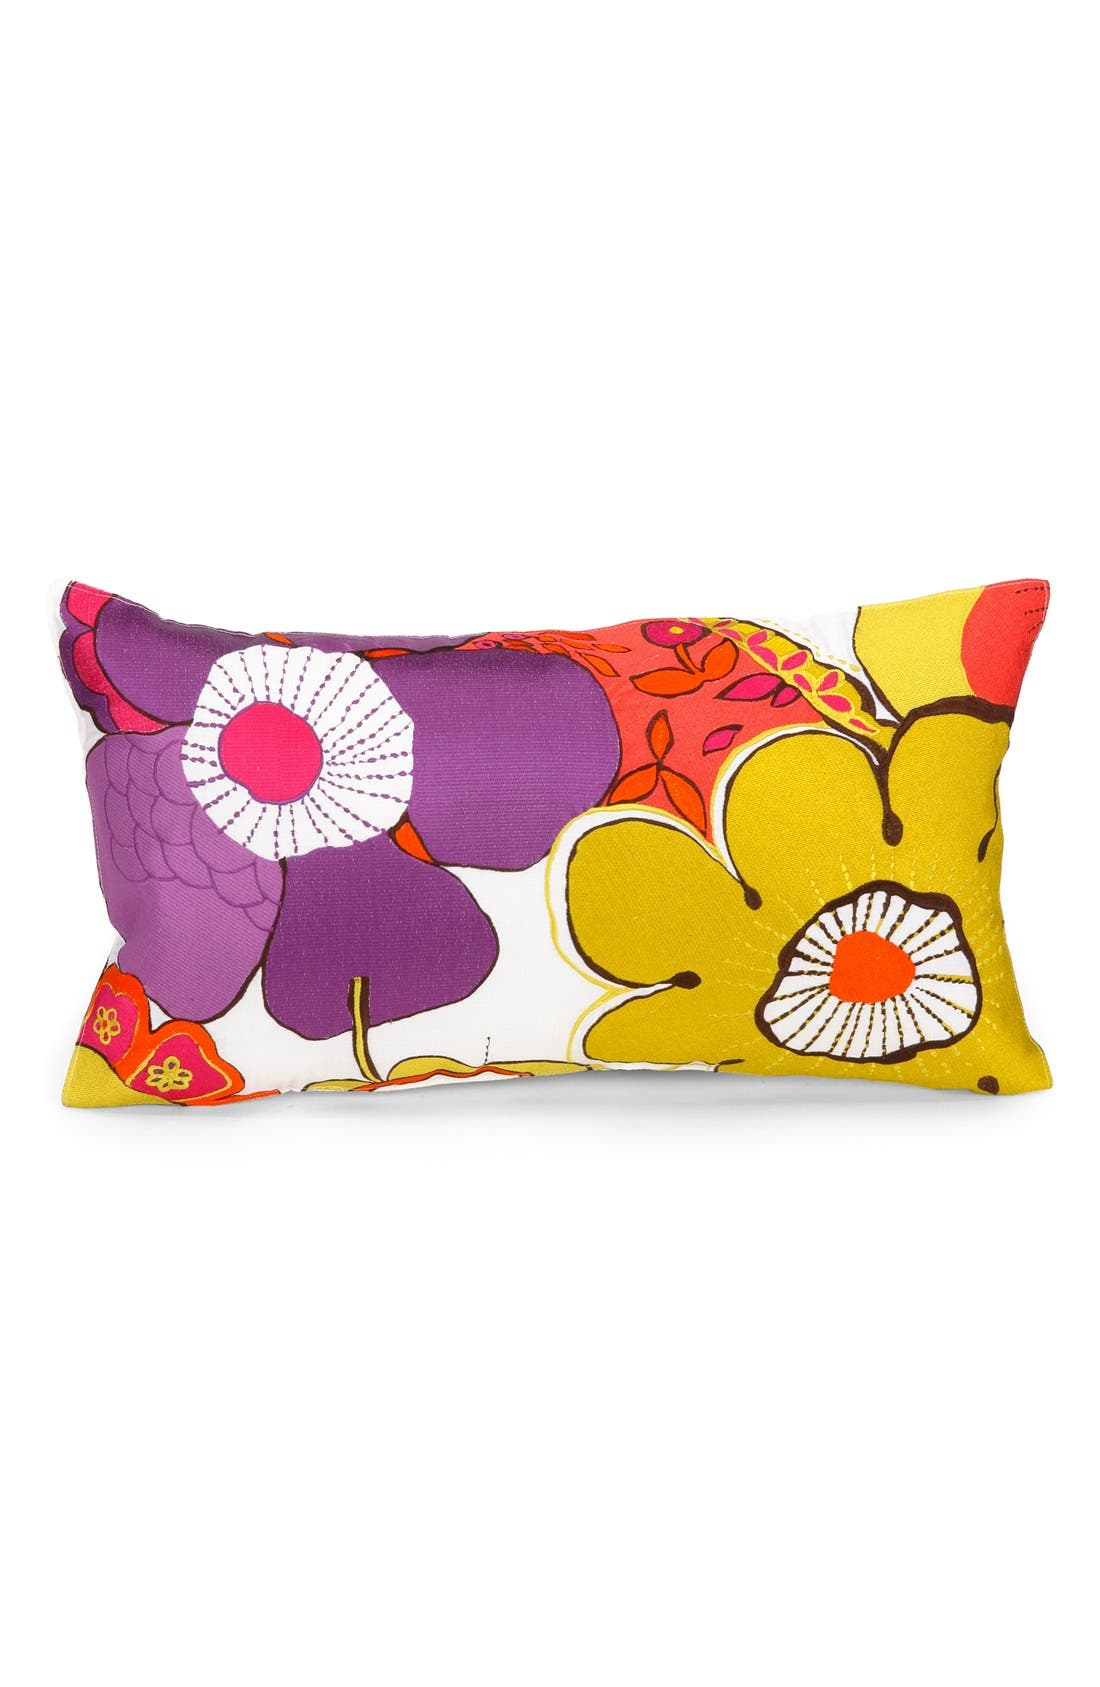 'Santorini' Pillow,                             Main thumbnail 1, color,                             100